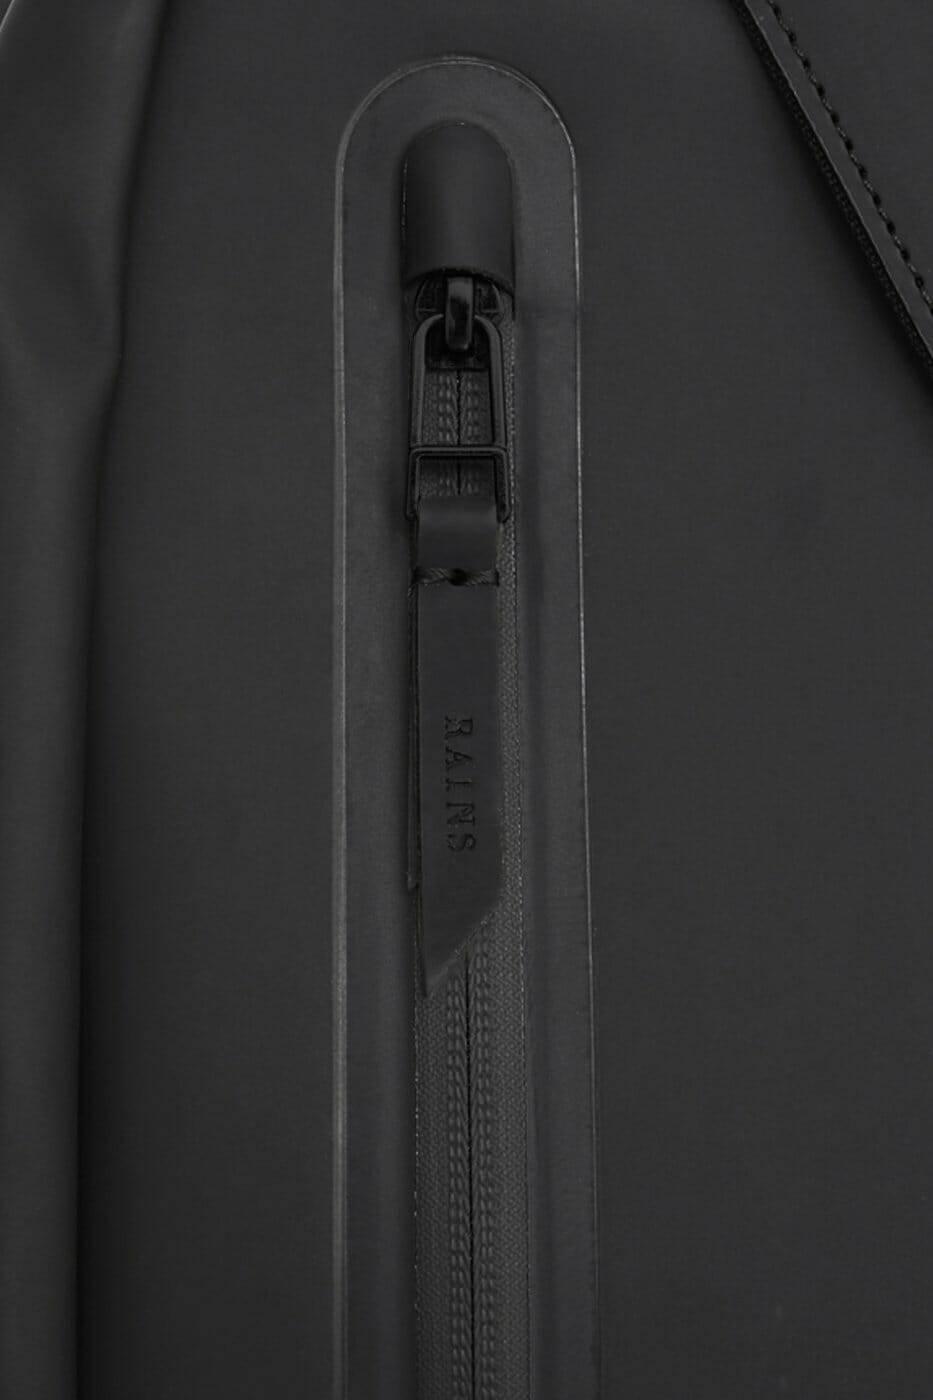 City_Backpack-Bags-1292-01_Black-2_1400x1400